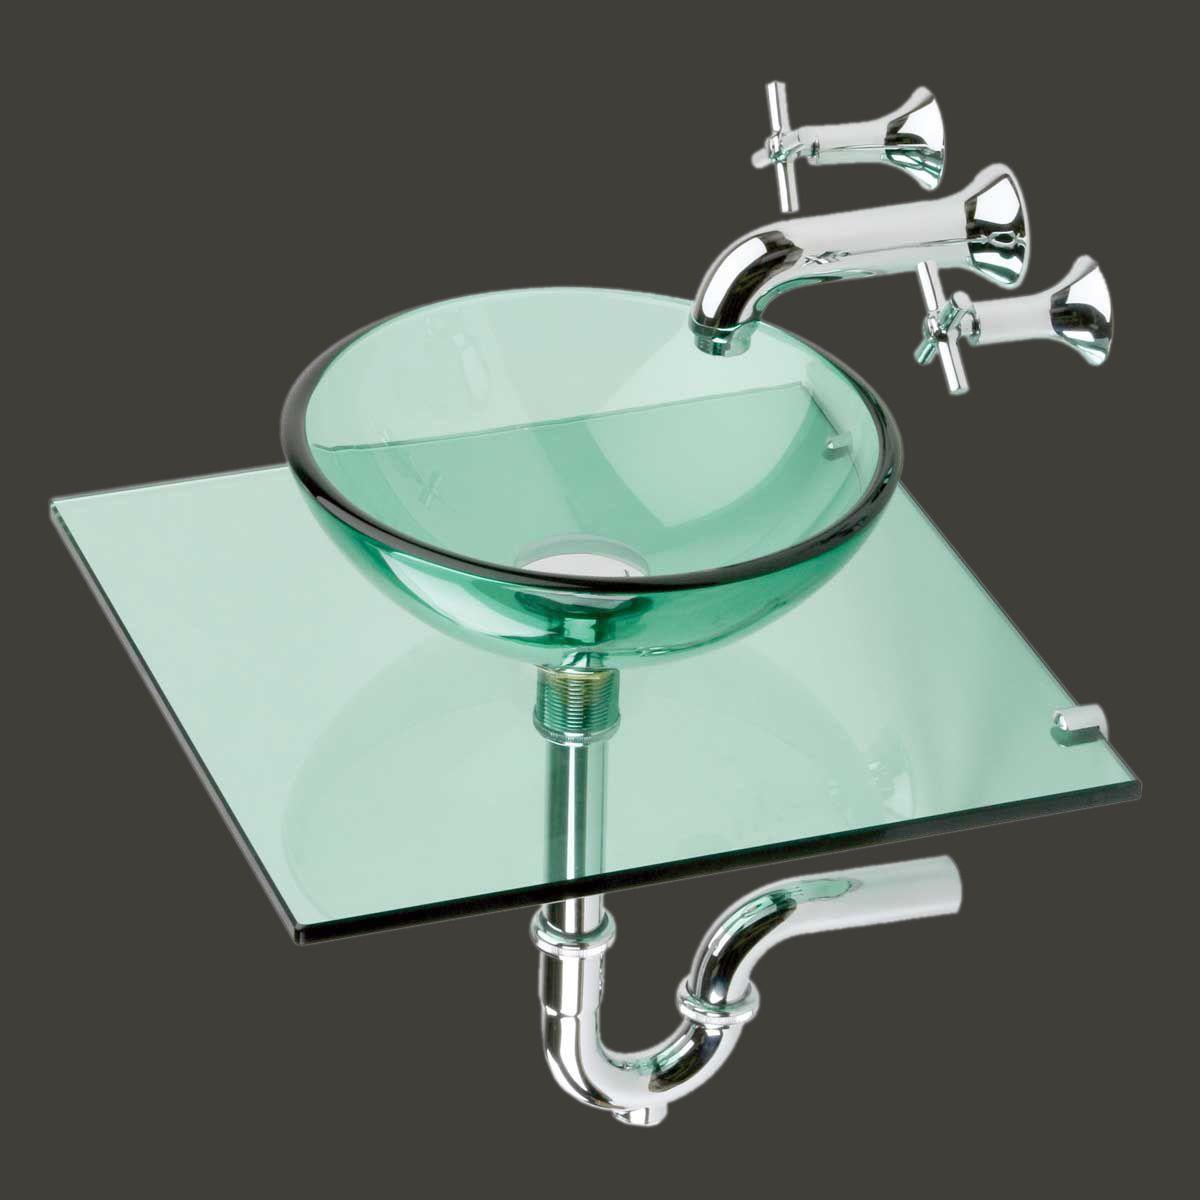 Small Glass Wall Mount Sink Mini Vessel Faucet Trap Kit Wall Mounted Sink Vessel Faucets Redesign Small Bathroom